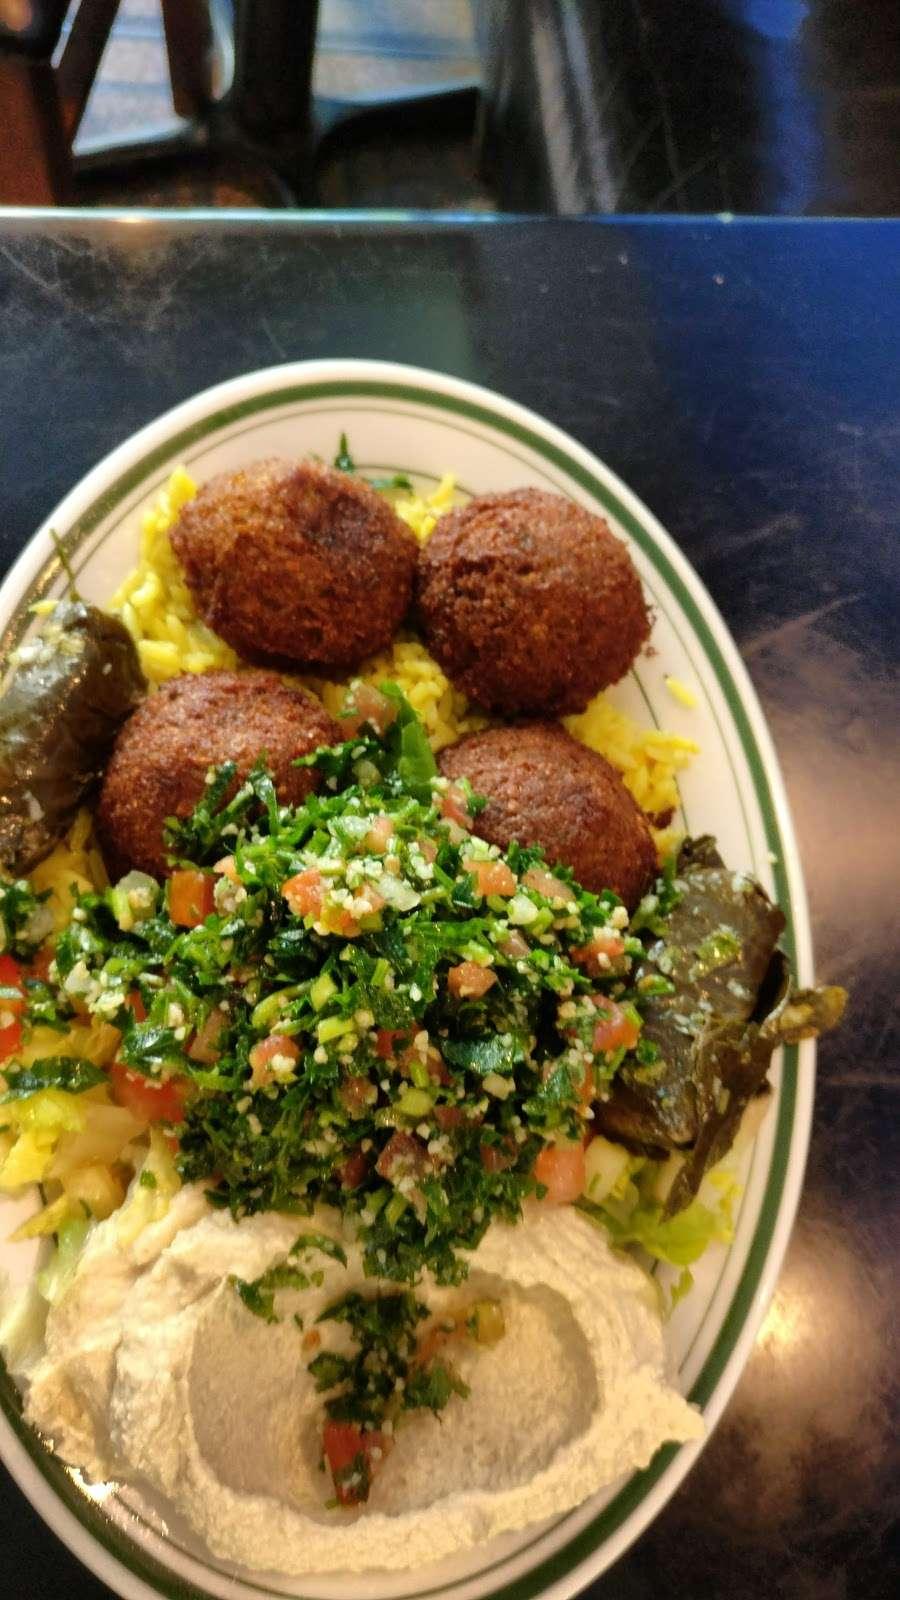 Heights Falafel - restaurant  | Photo 8 of 10 | Address: 78 Henry St, Brooklyn, NY 11201, USA | Phone: (718) 488-0808